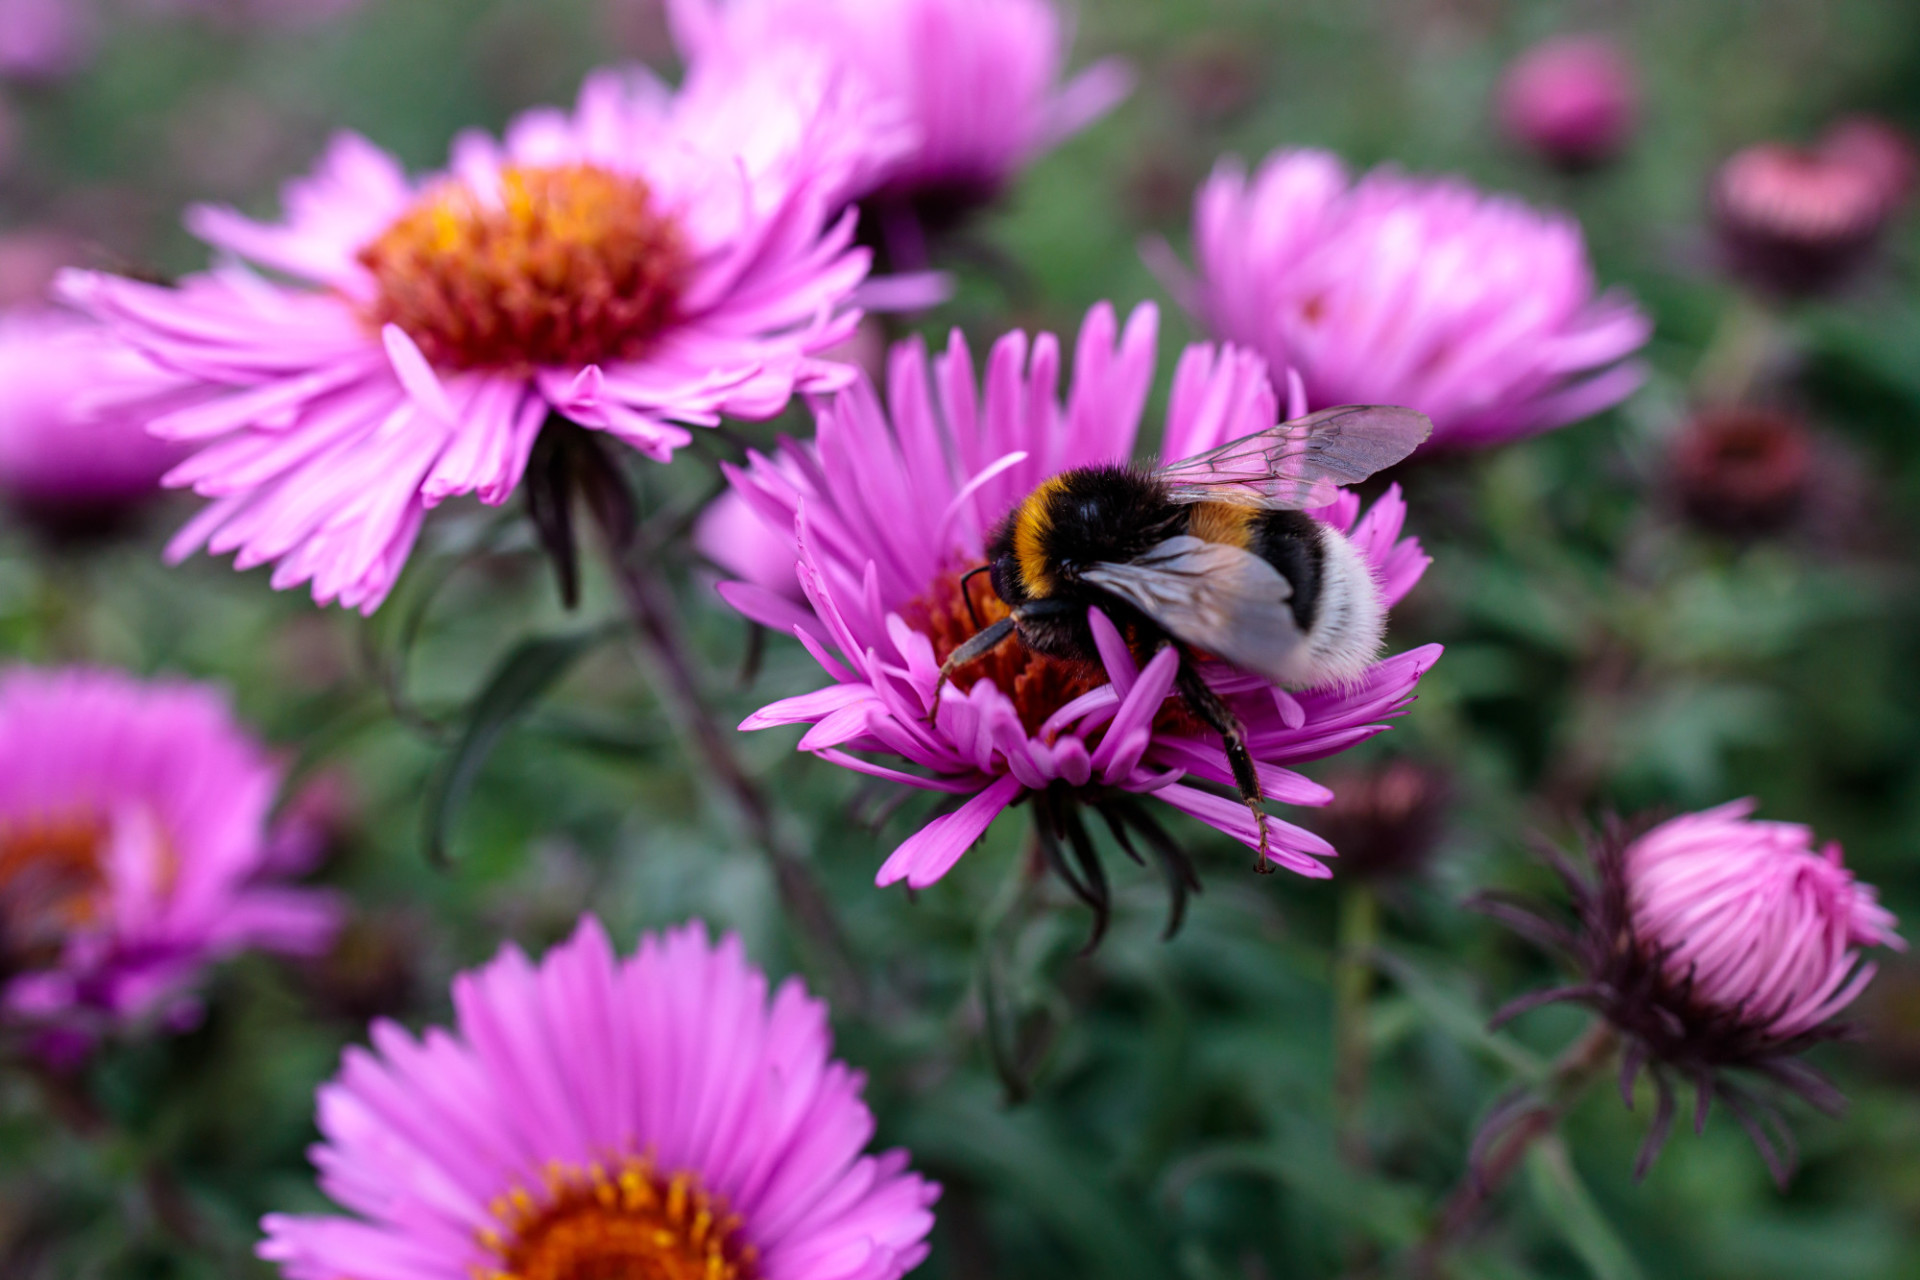 Bumblebee collecting nectar